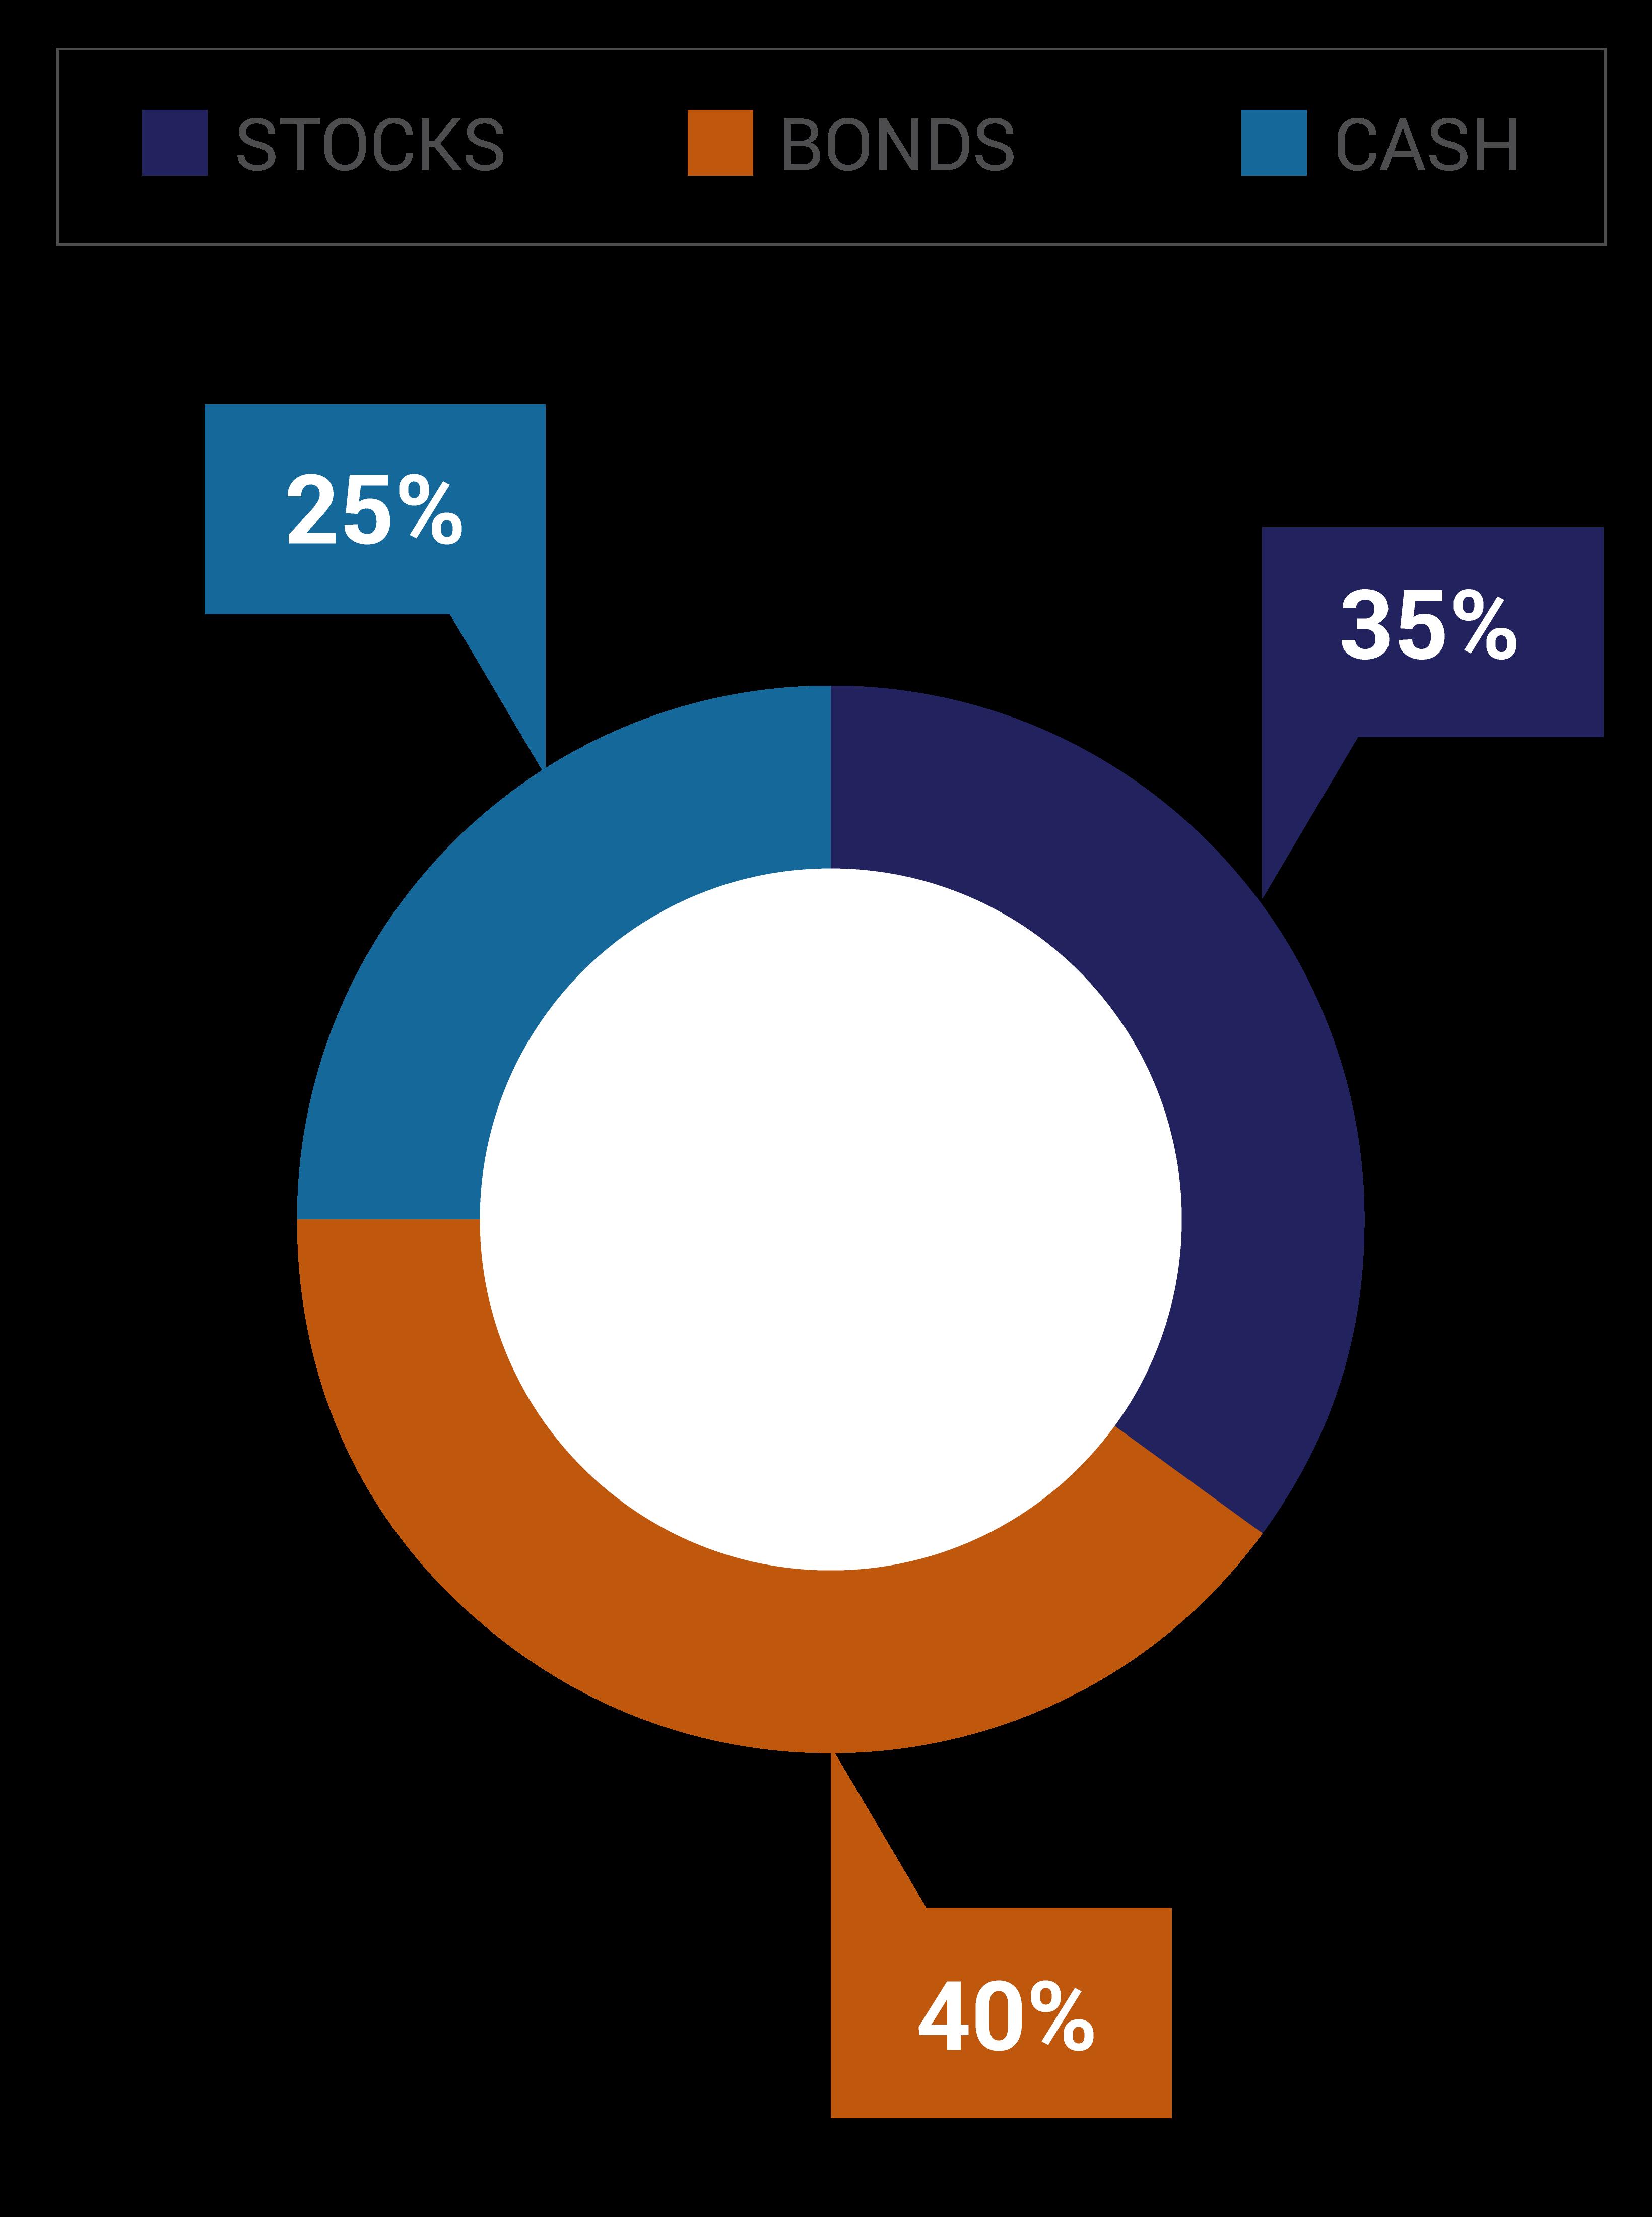 The Intermediate Portfolio Option consists of 35% Stocks, 40% Bonds, and 25% Cash.